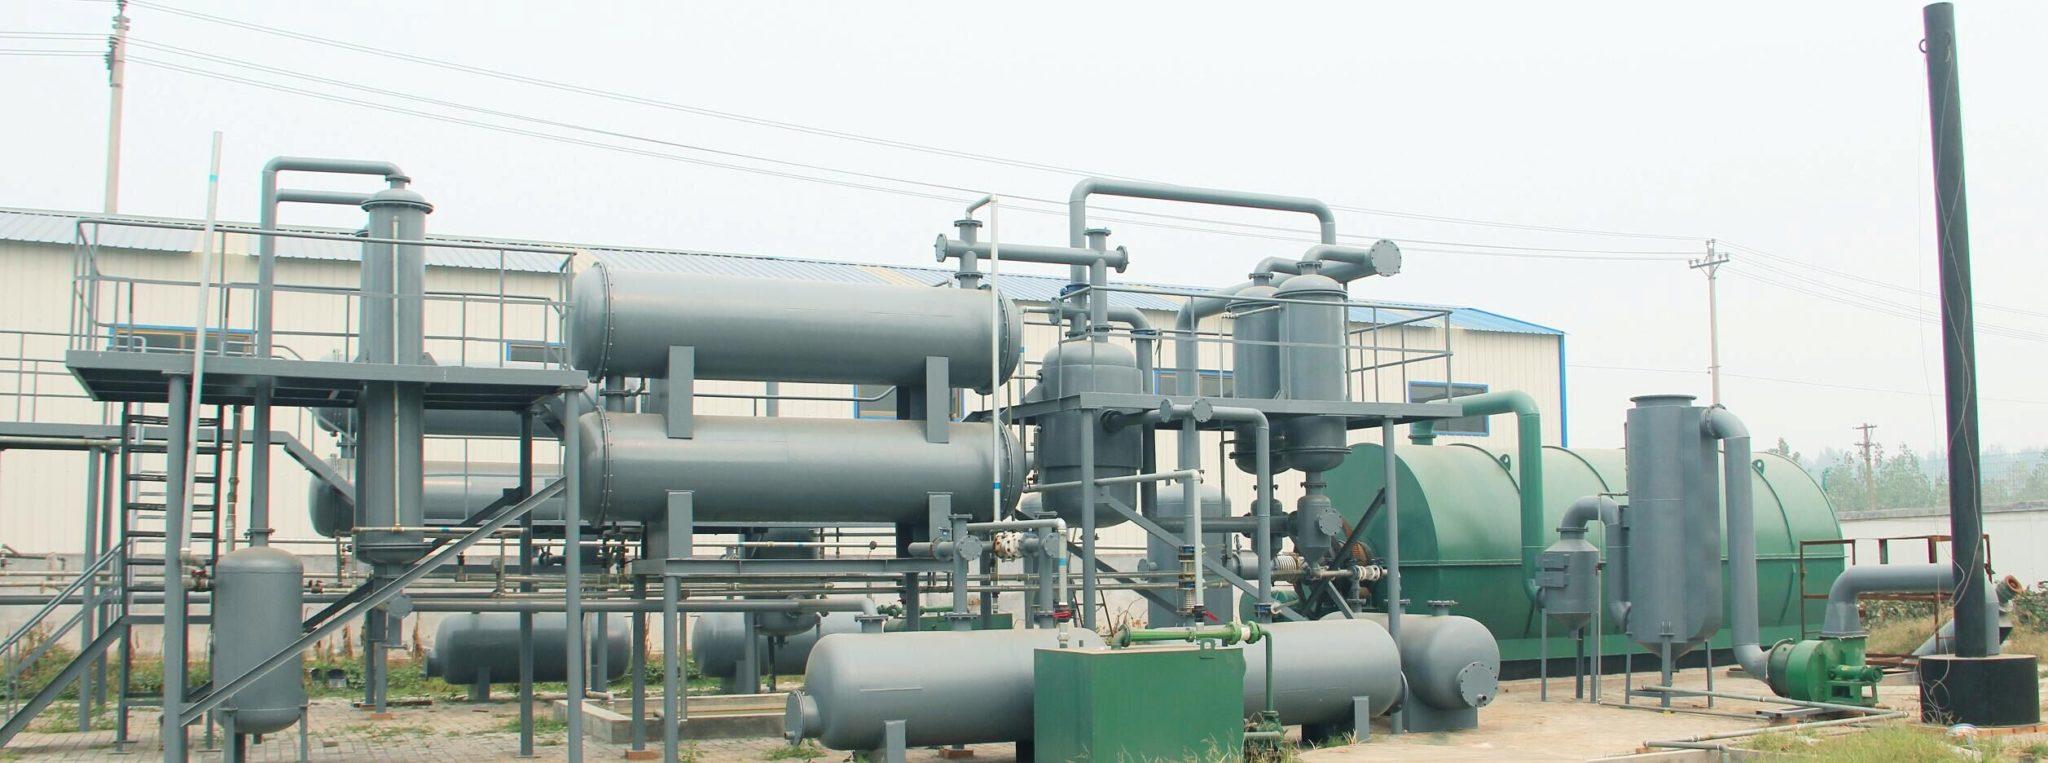 Перереработка и утилизация топлива